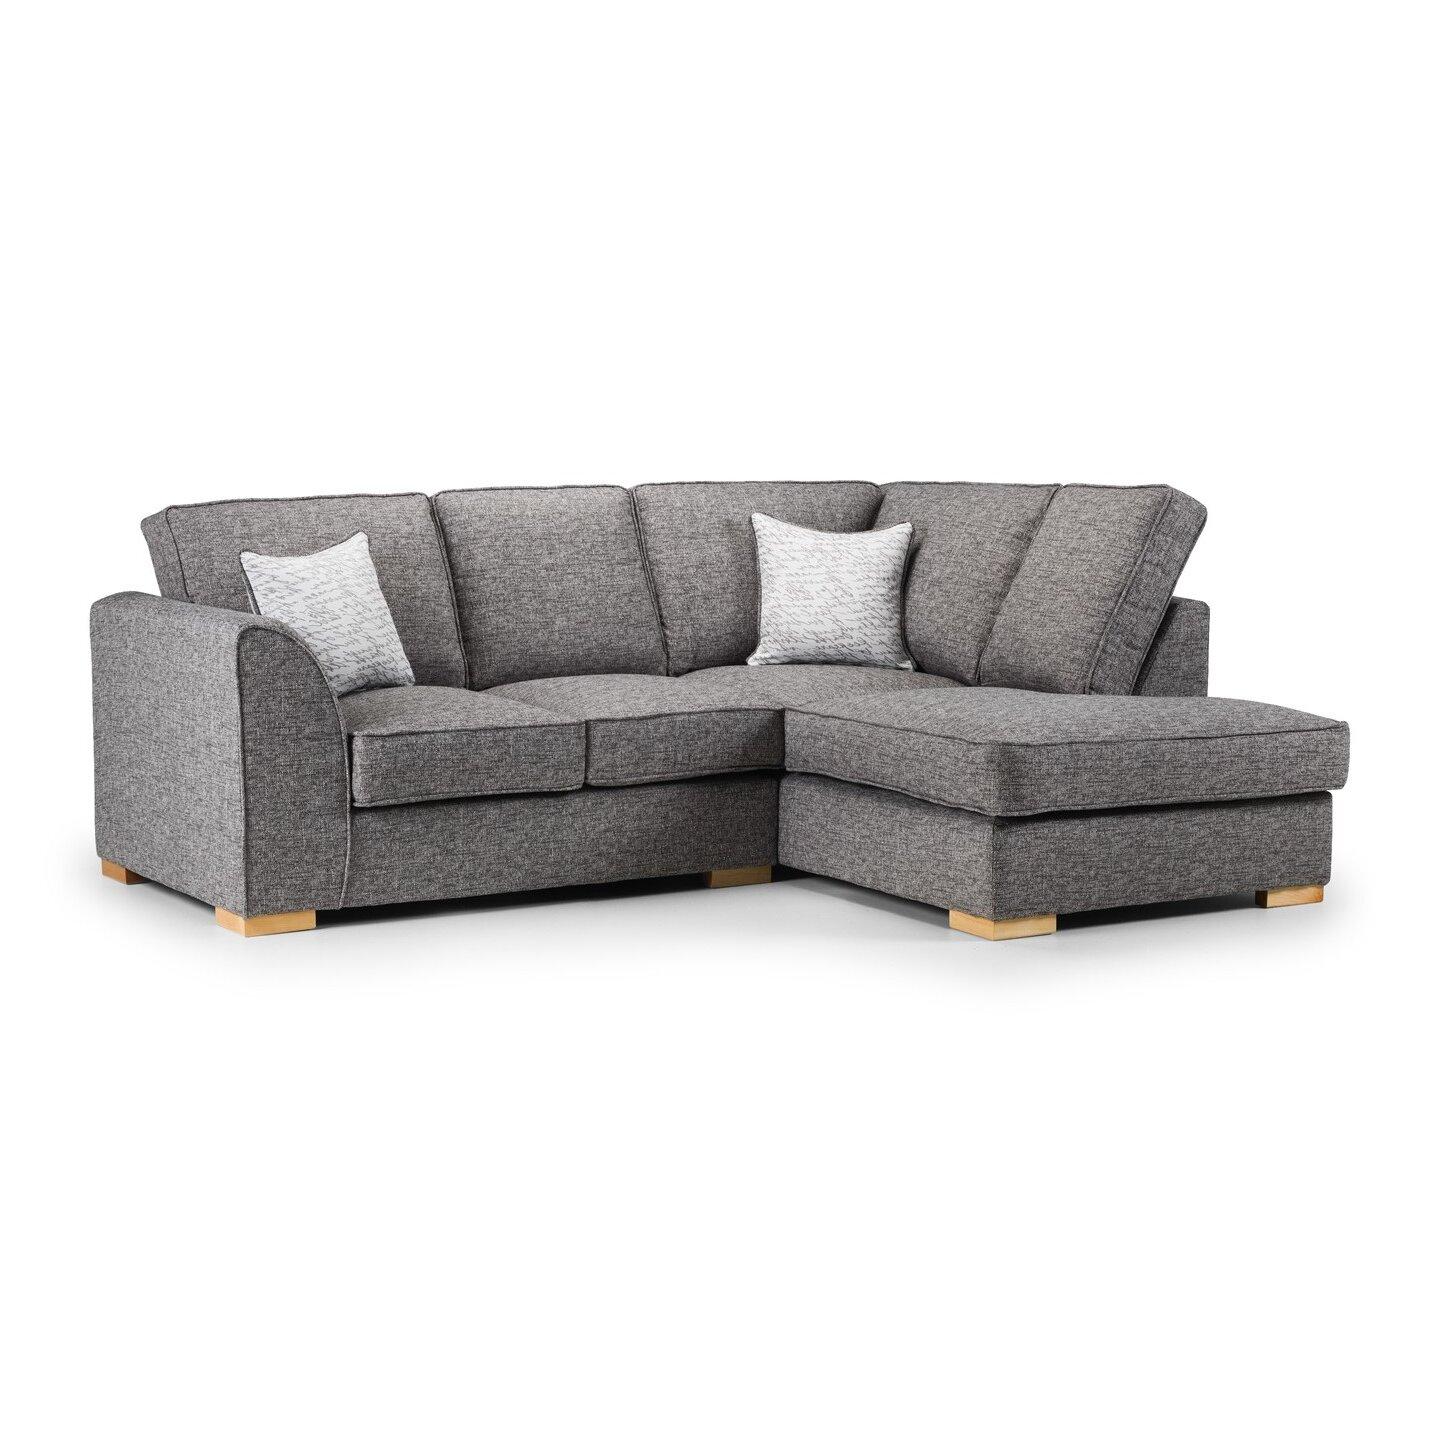 Sleeper Sofa Dallas: DandGSofas Dallas Corner Sofa